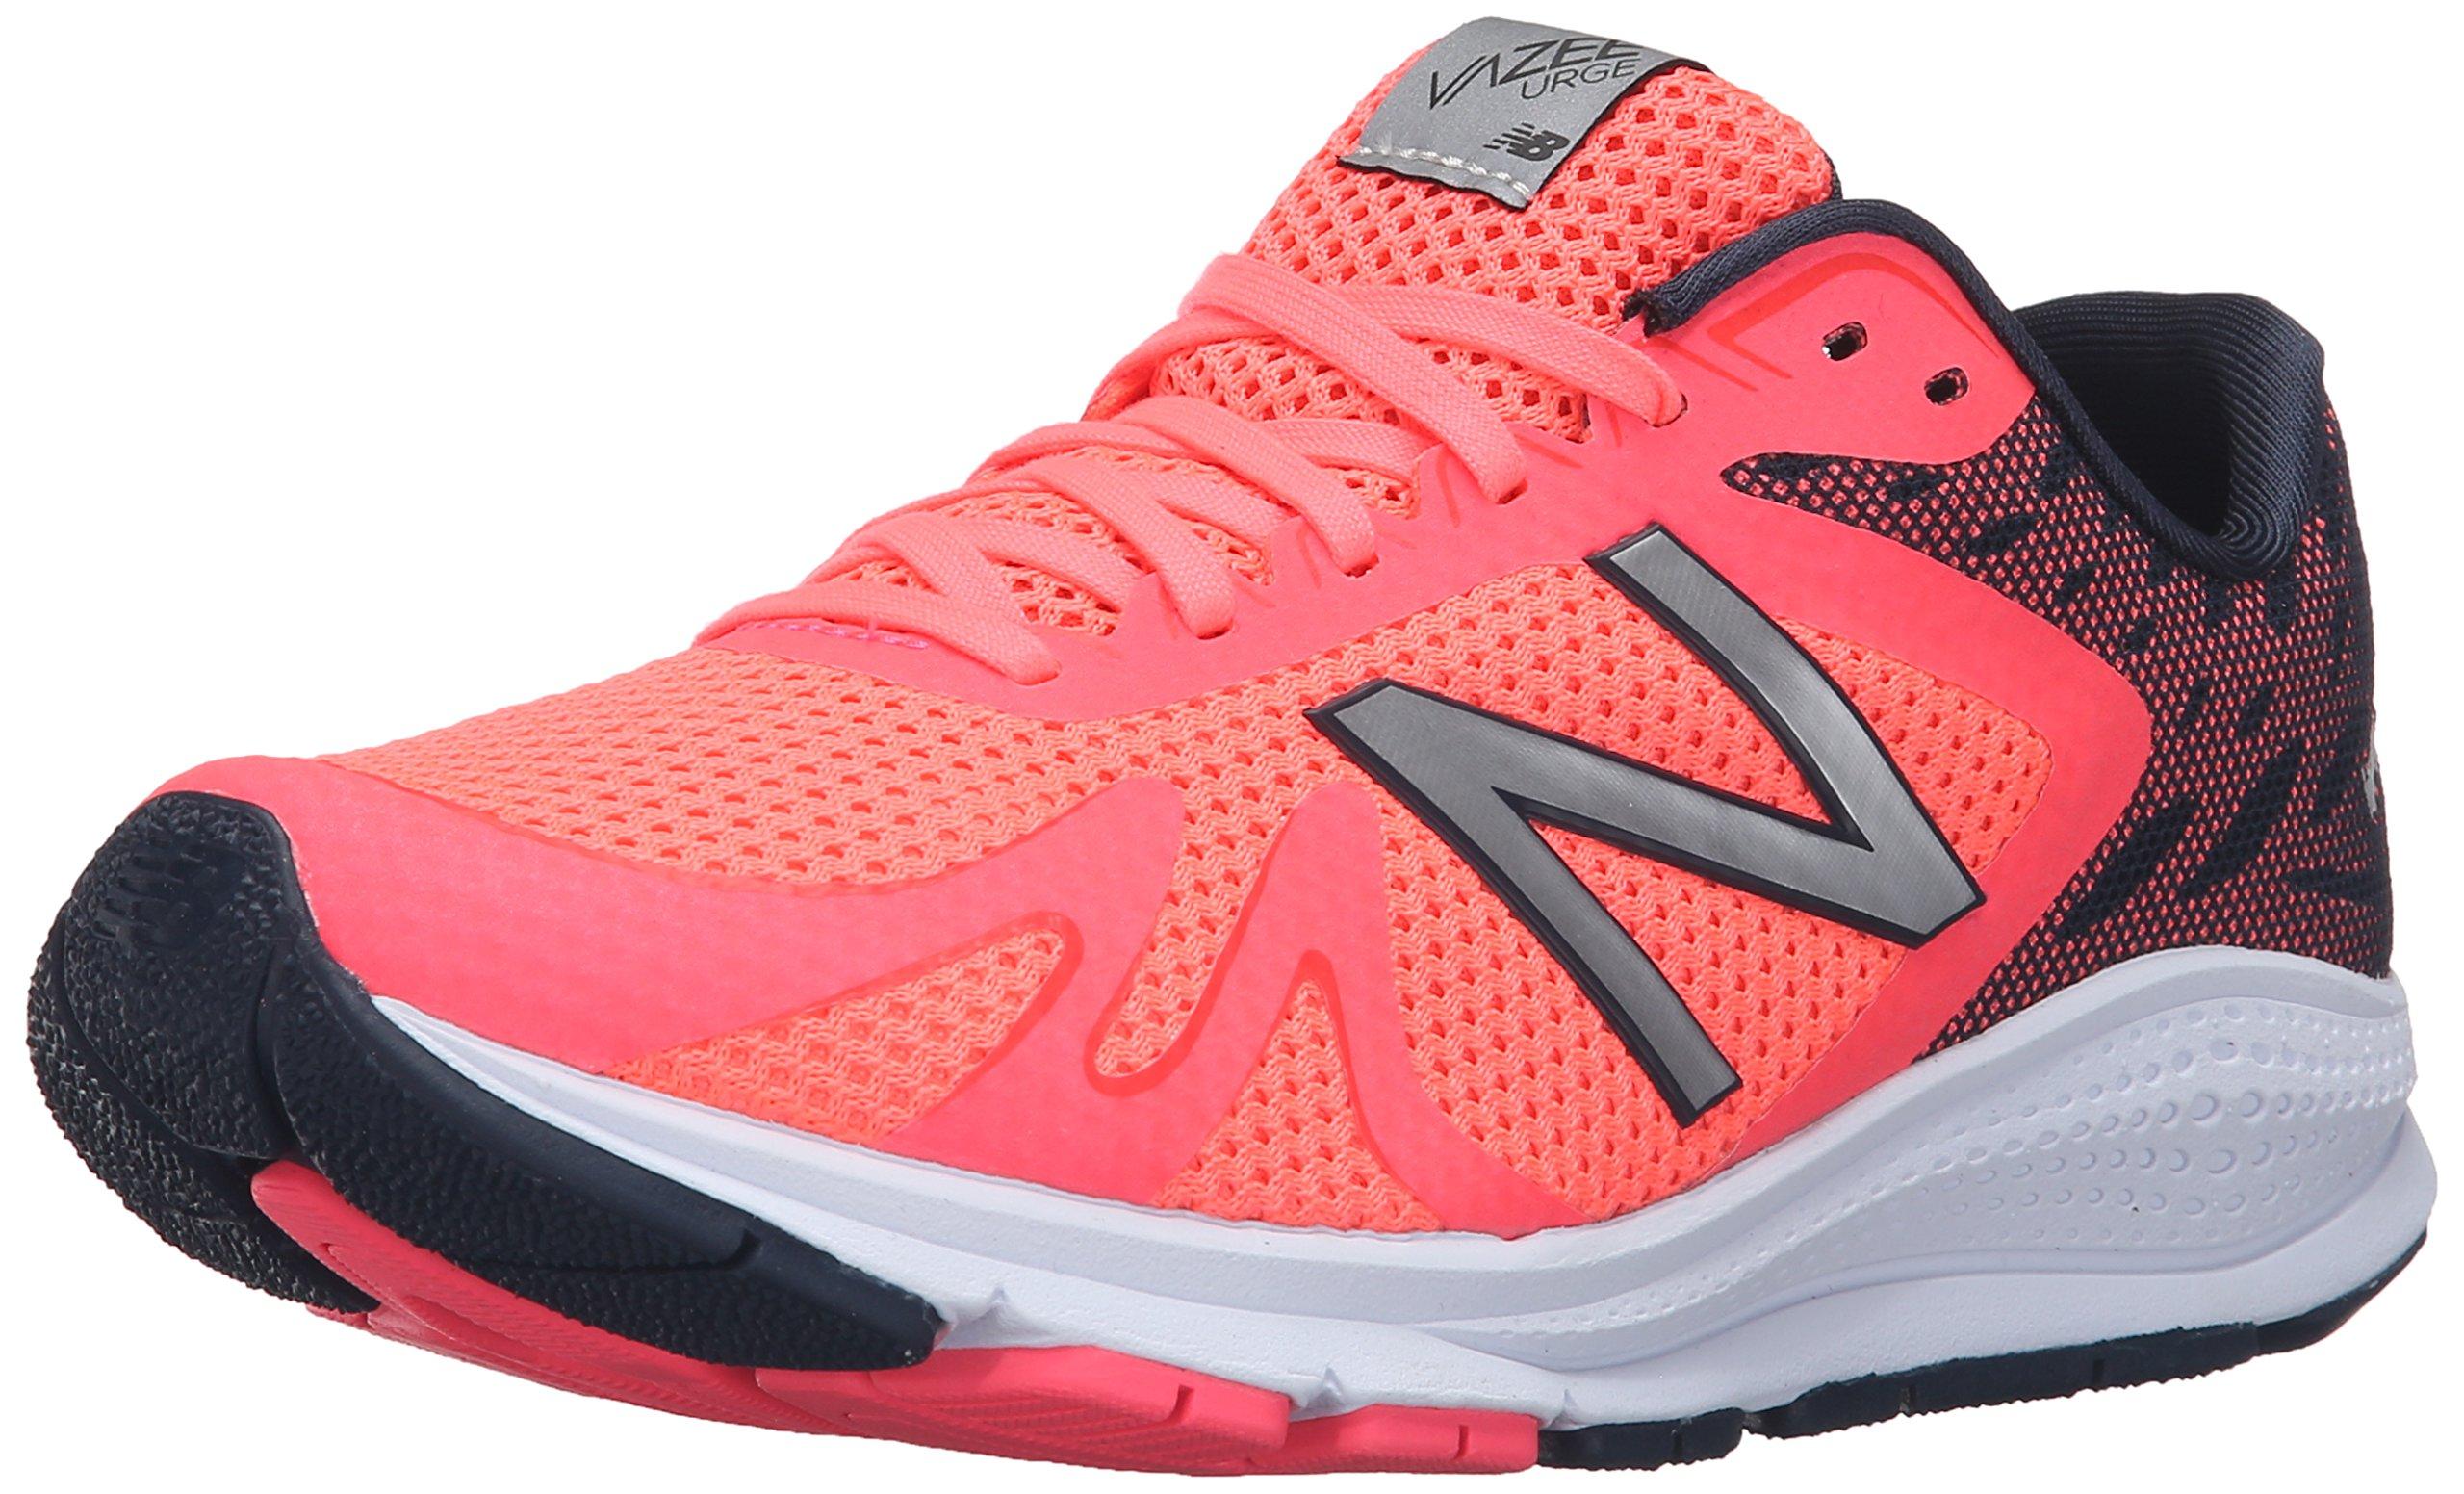 New Balance Women's Vazee Urge Training Running Shoes- Buy Online ...